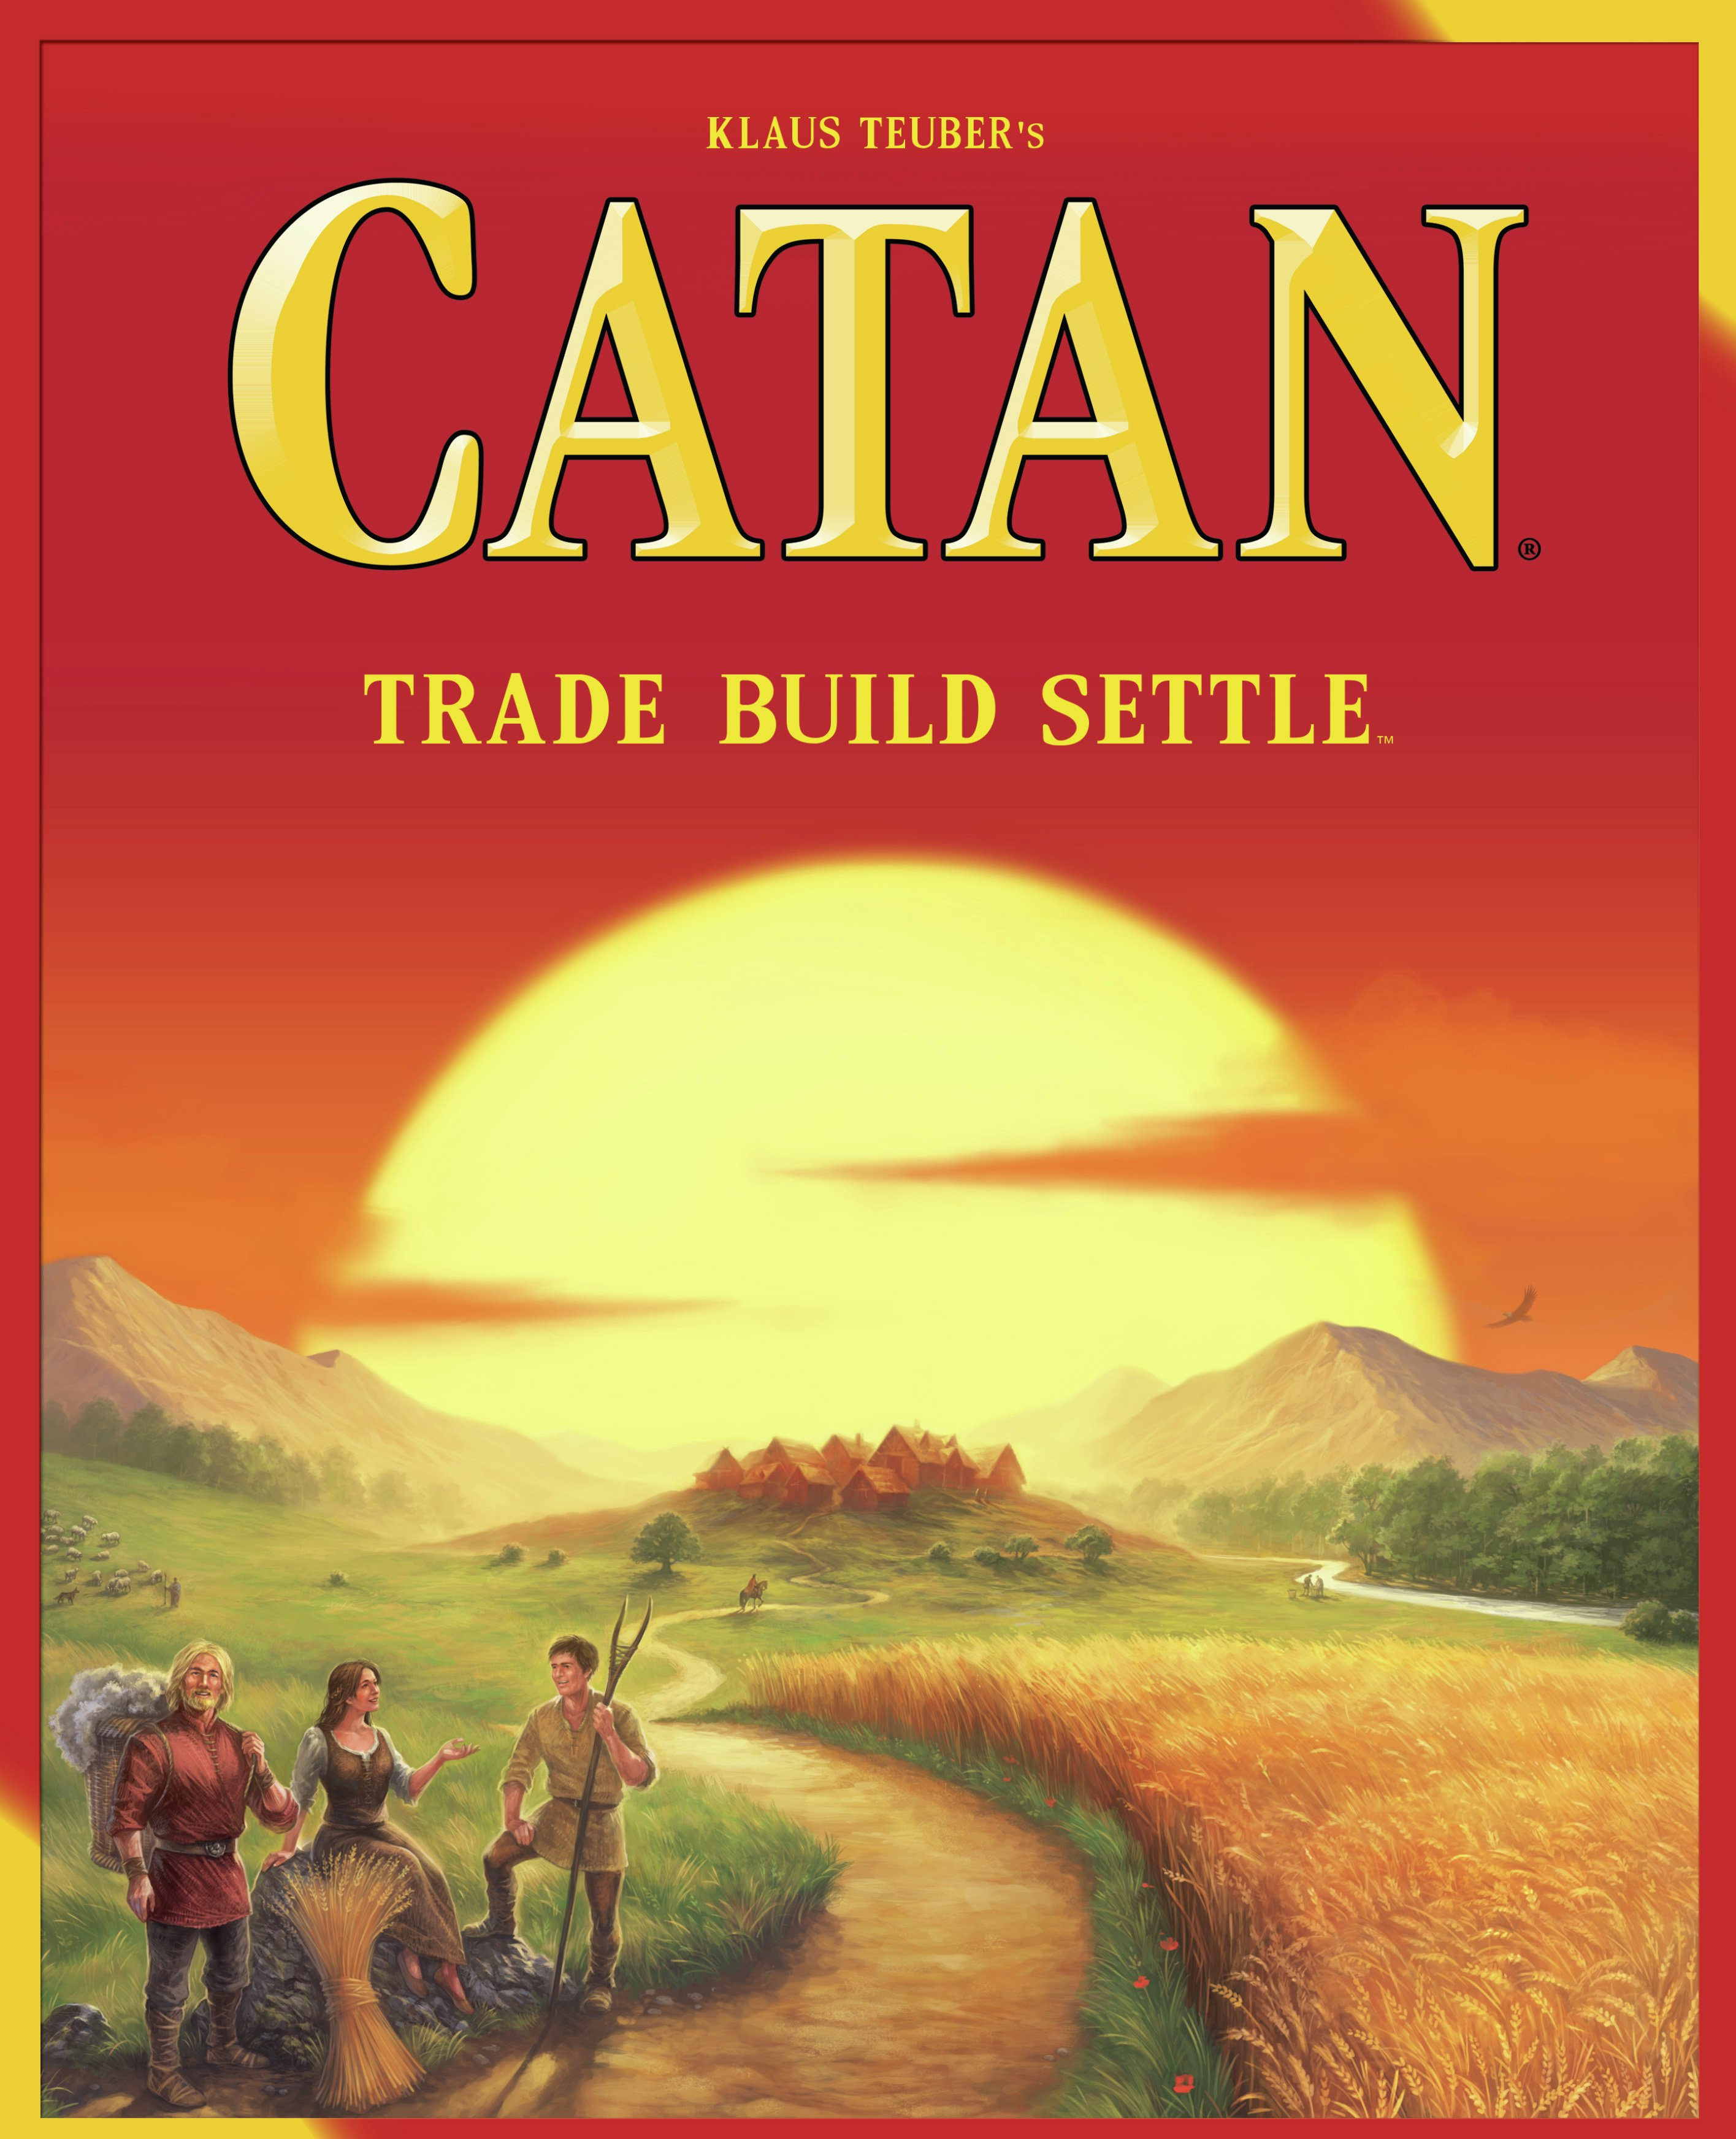 Image of Catan Game.